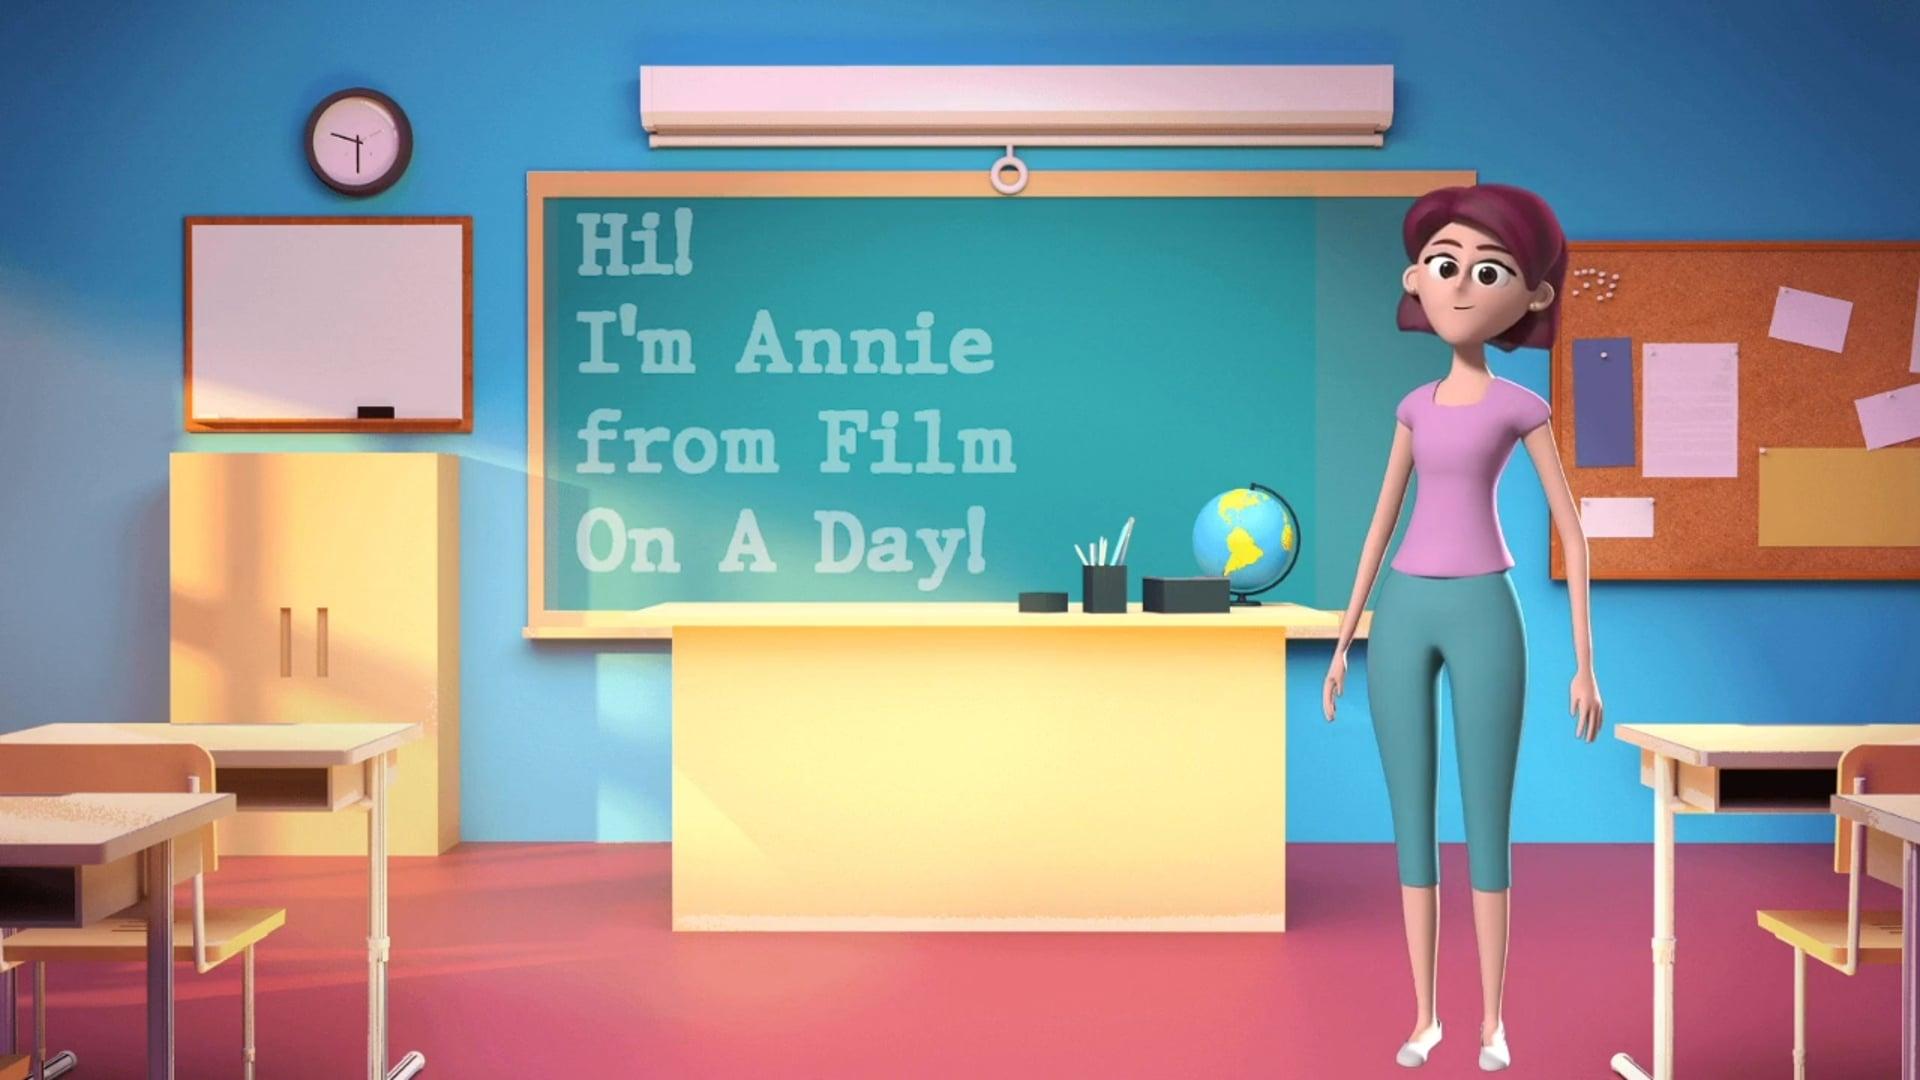 Filmonaday 3D Animation Style Vids